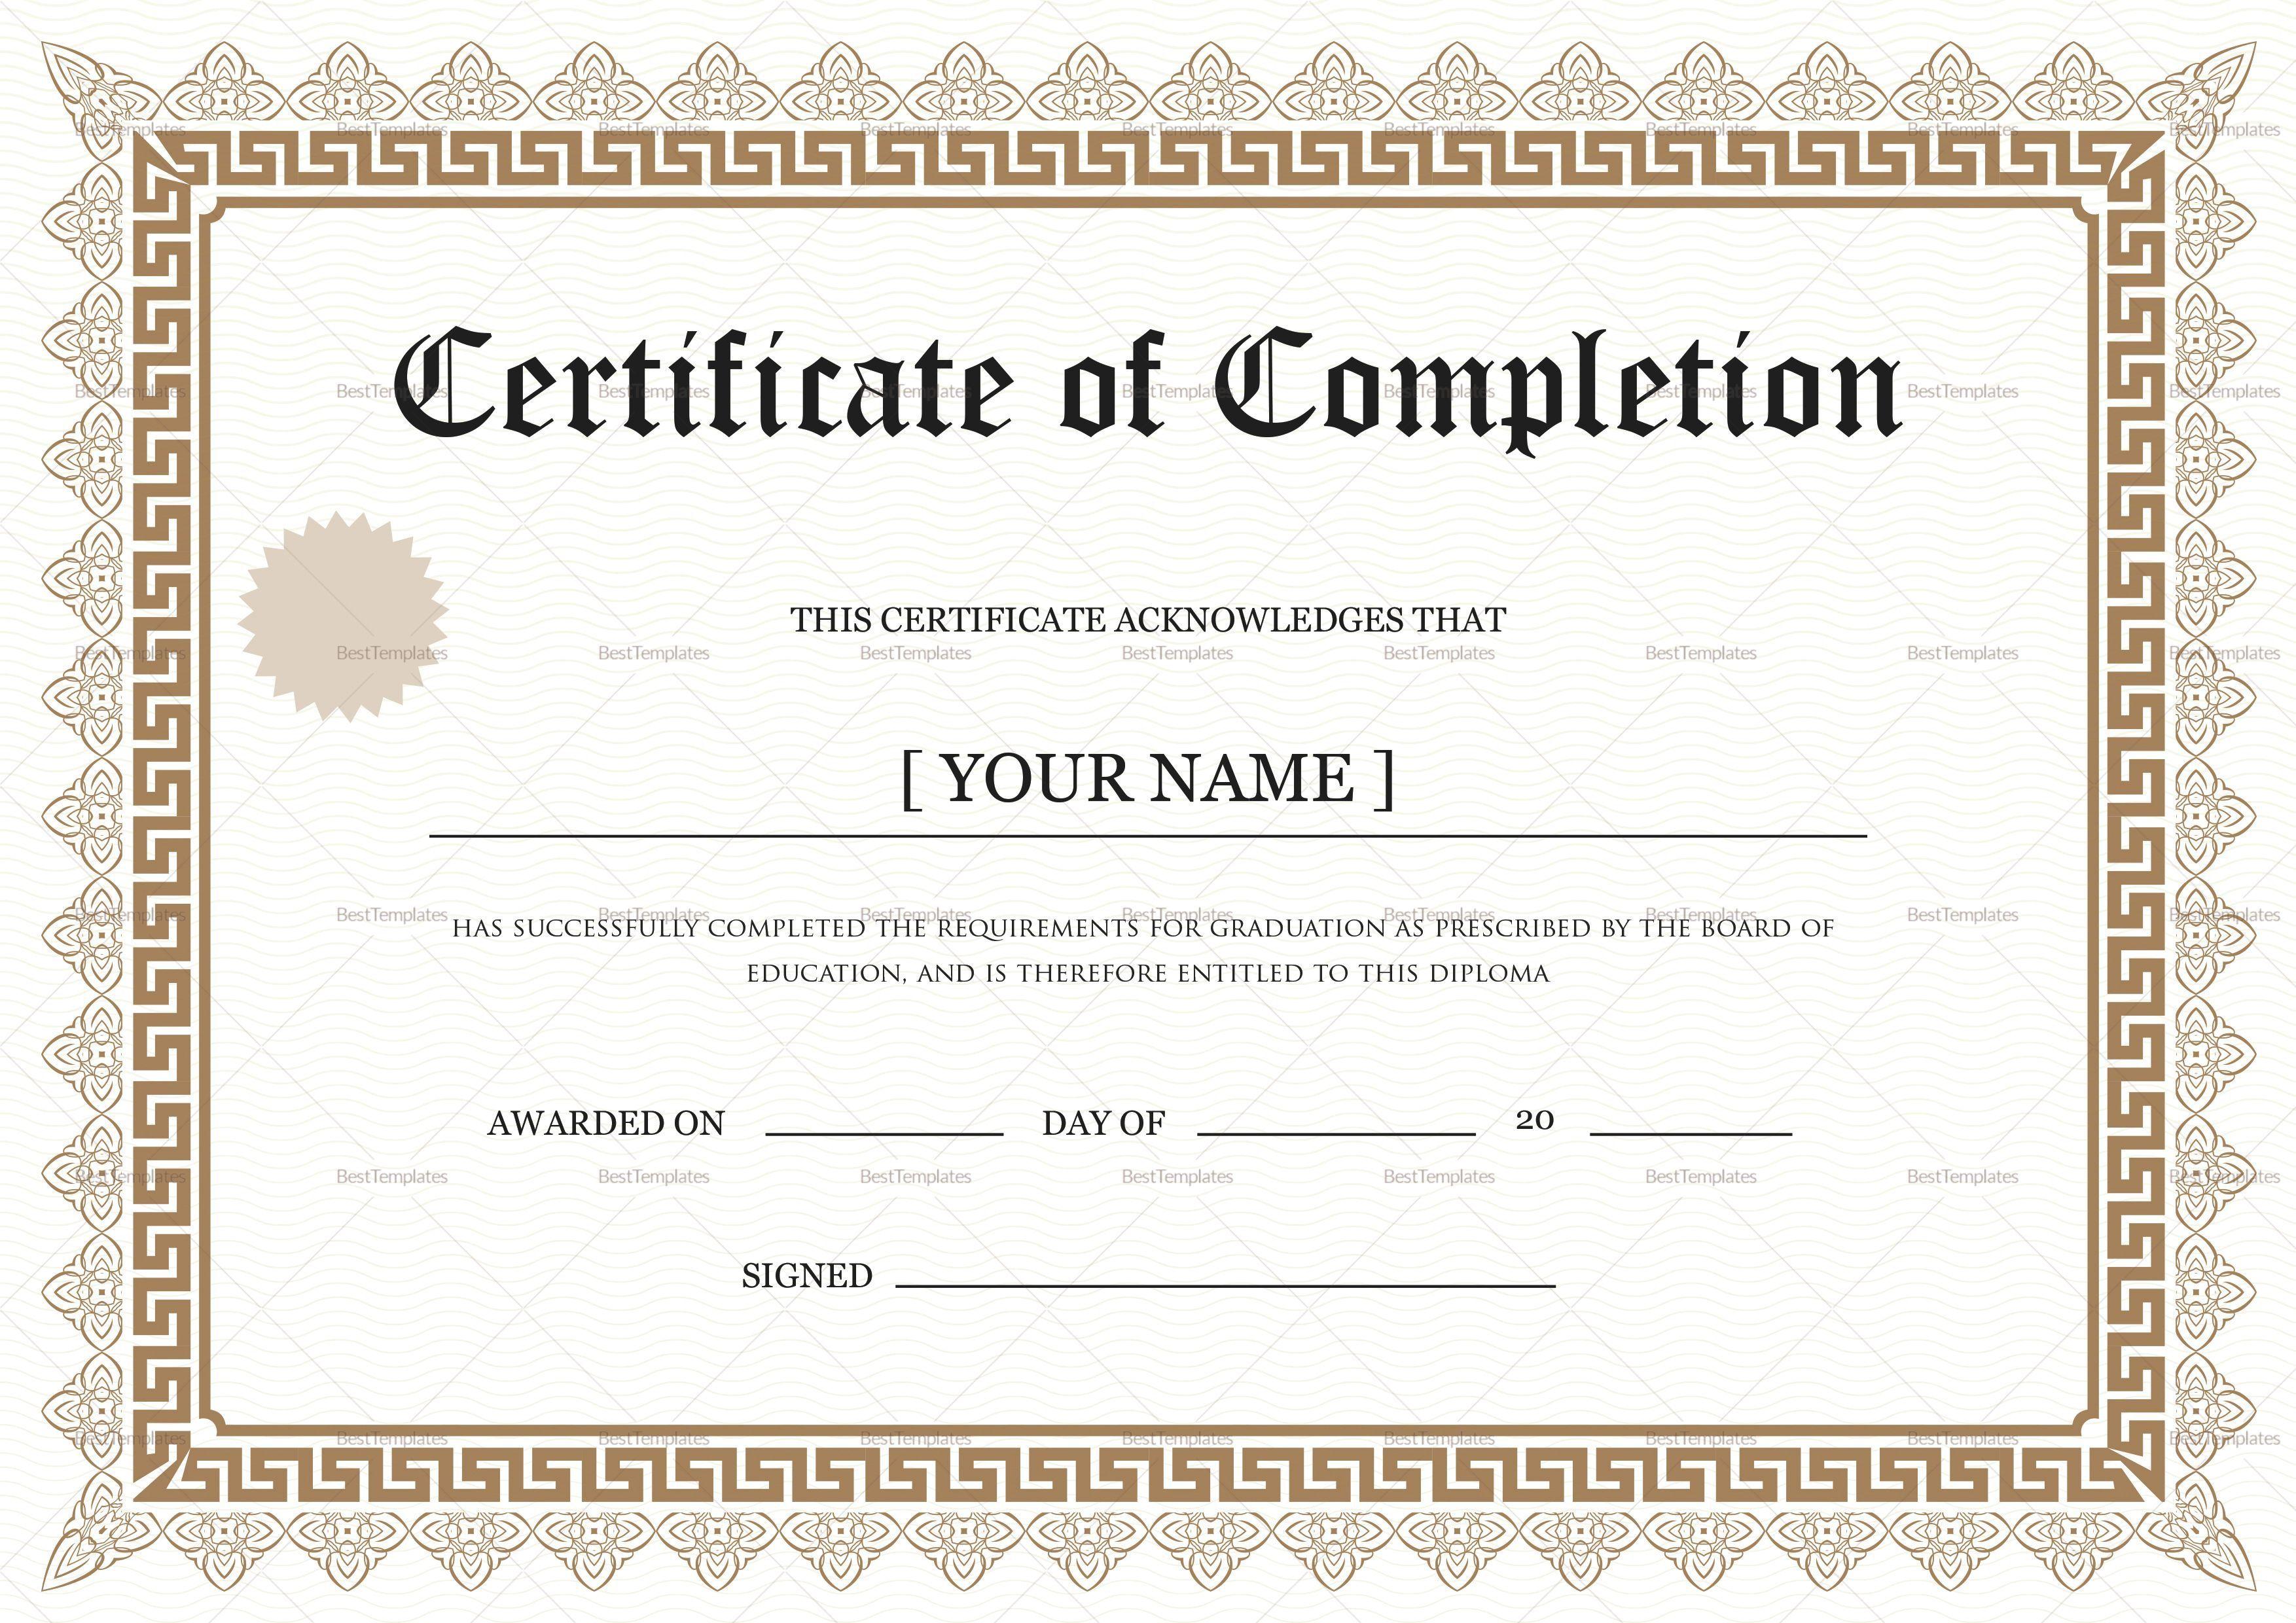 001 Wonderful Degree Certificate Template Word Photo Full